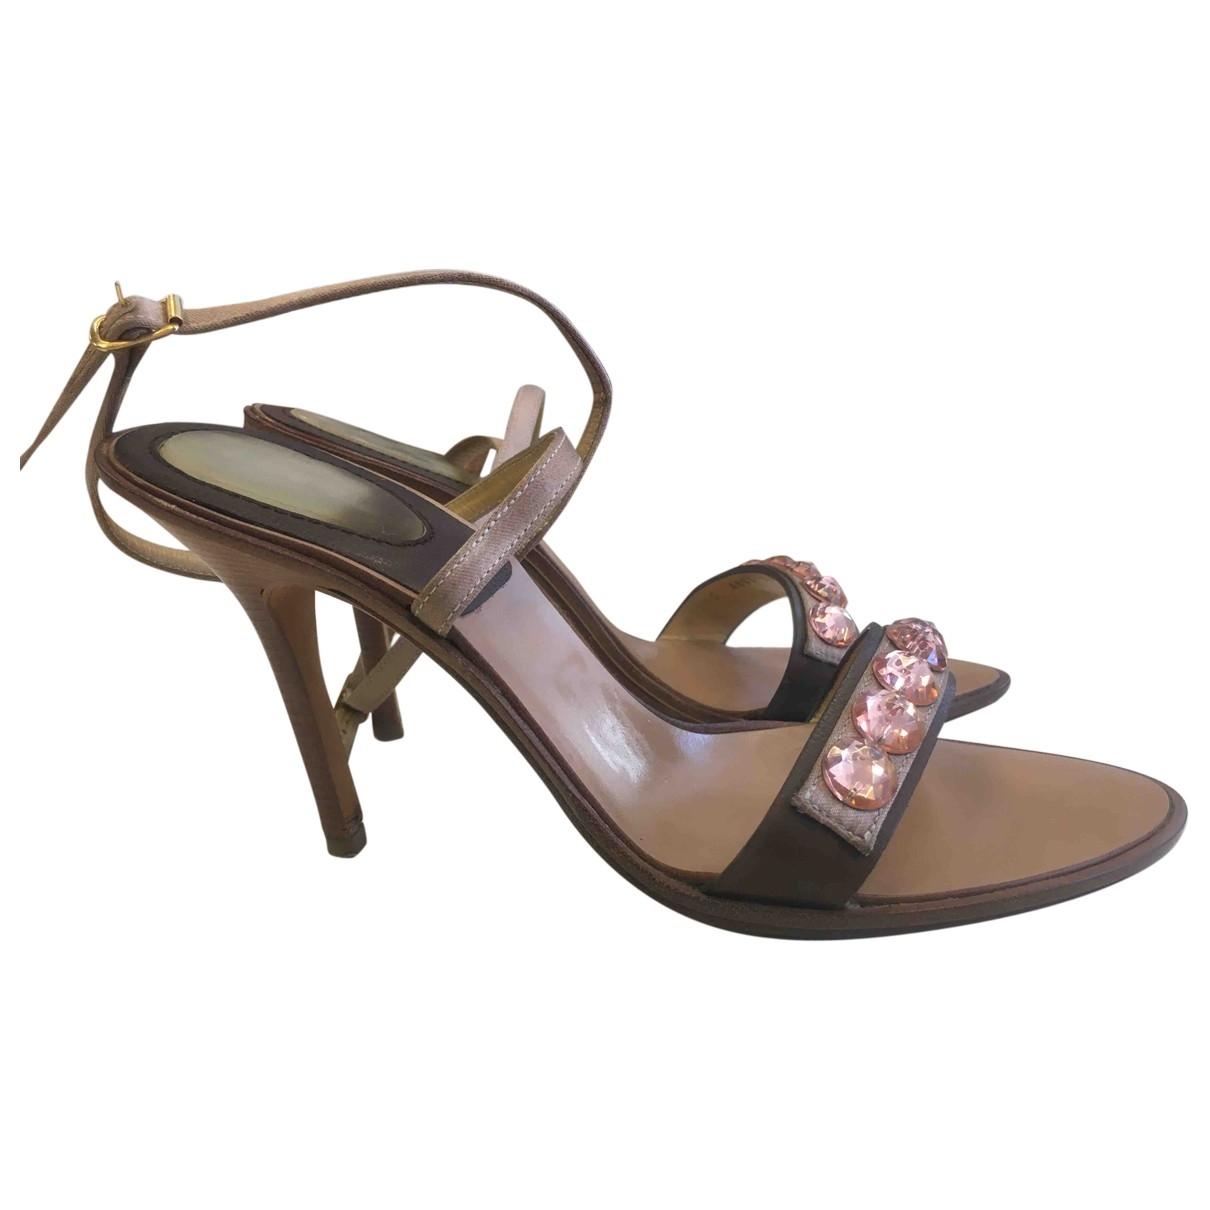 Casadei \N Beige Leather Heels for Women 7 US